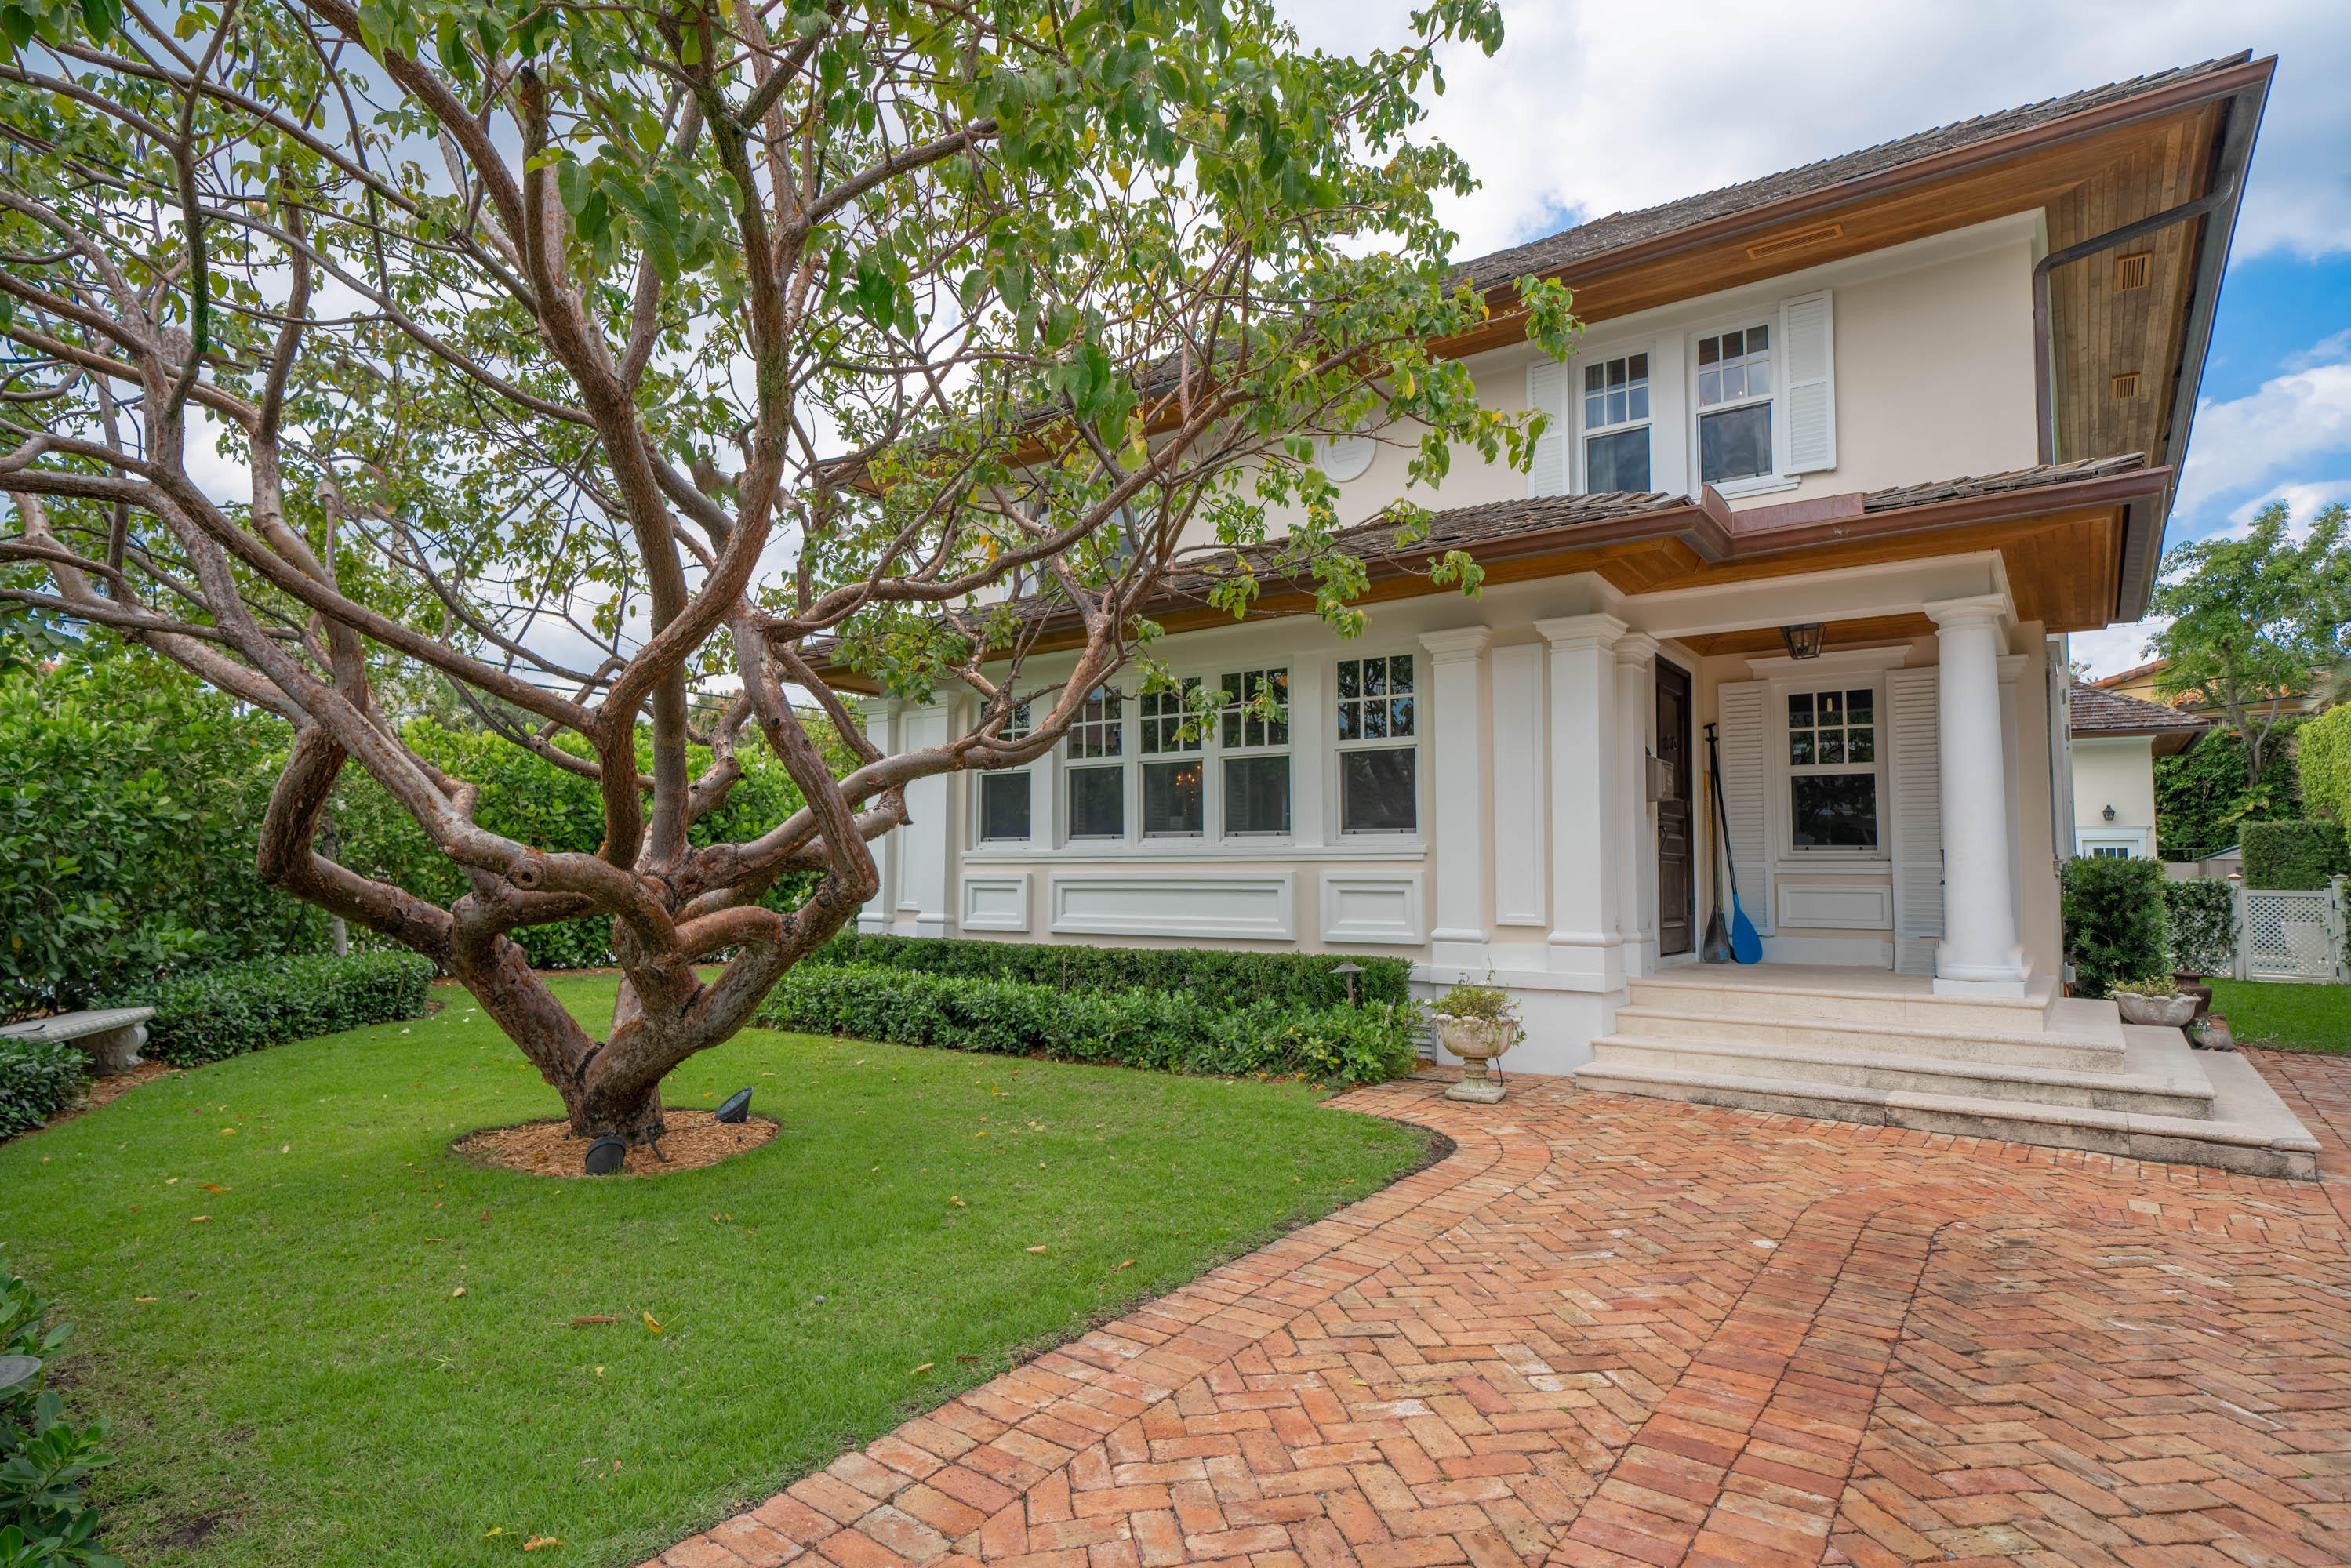 359 Seaspray Avenue - Palm Beach, Florida